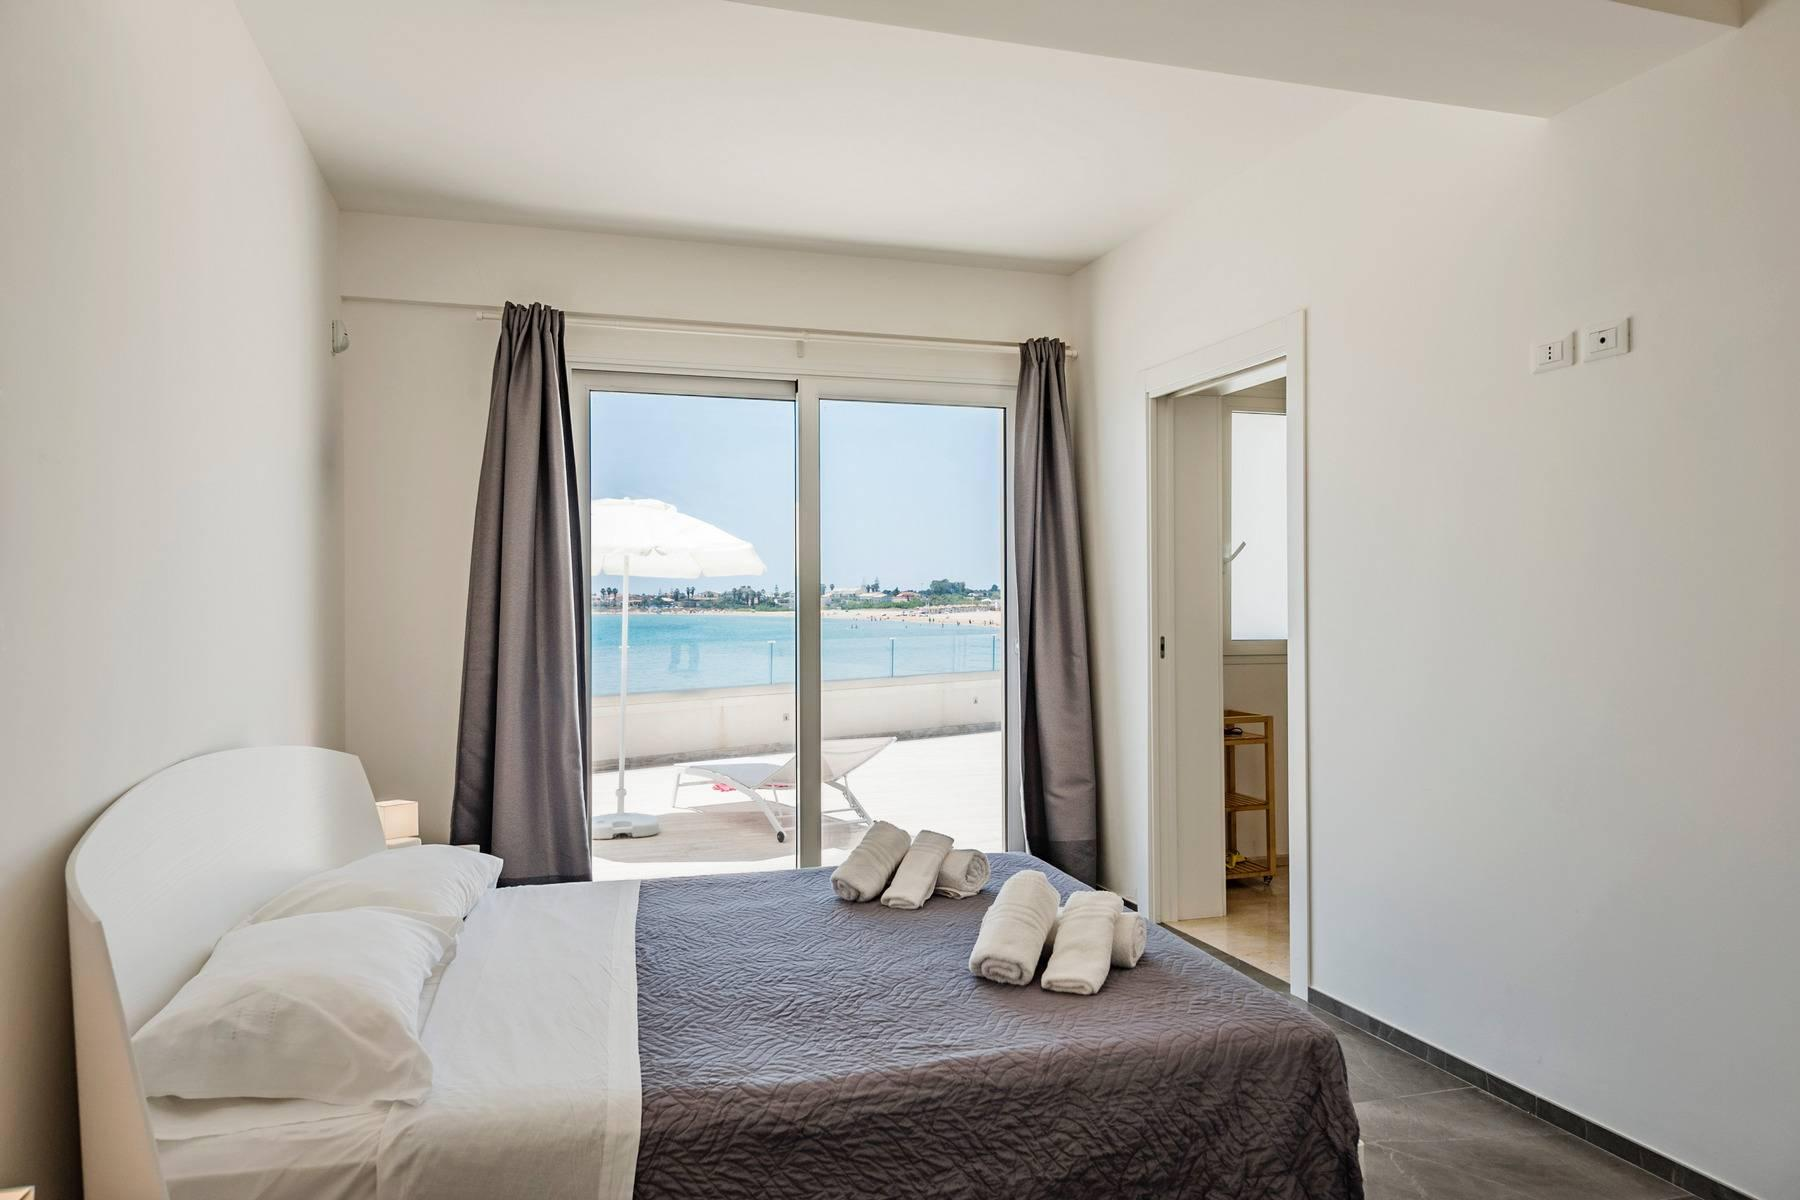 Exclusive villa with sea view in Avola - 9